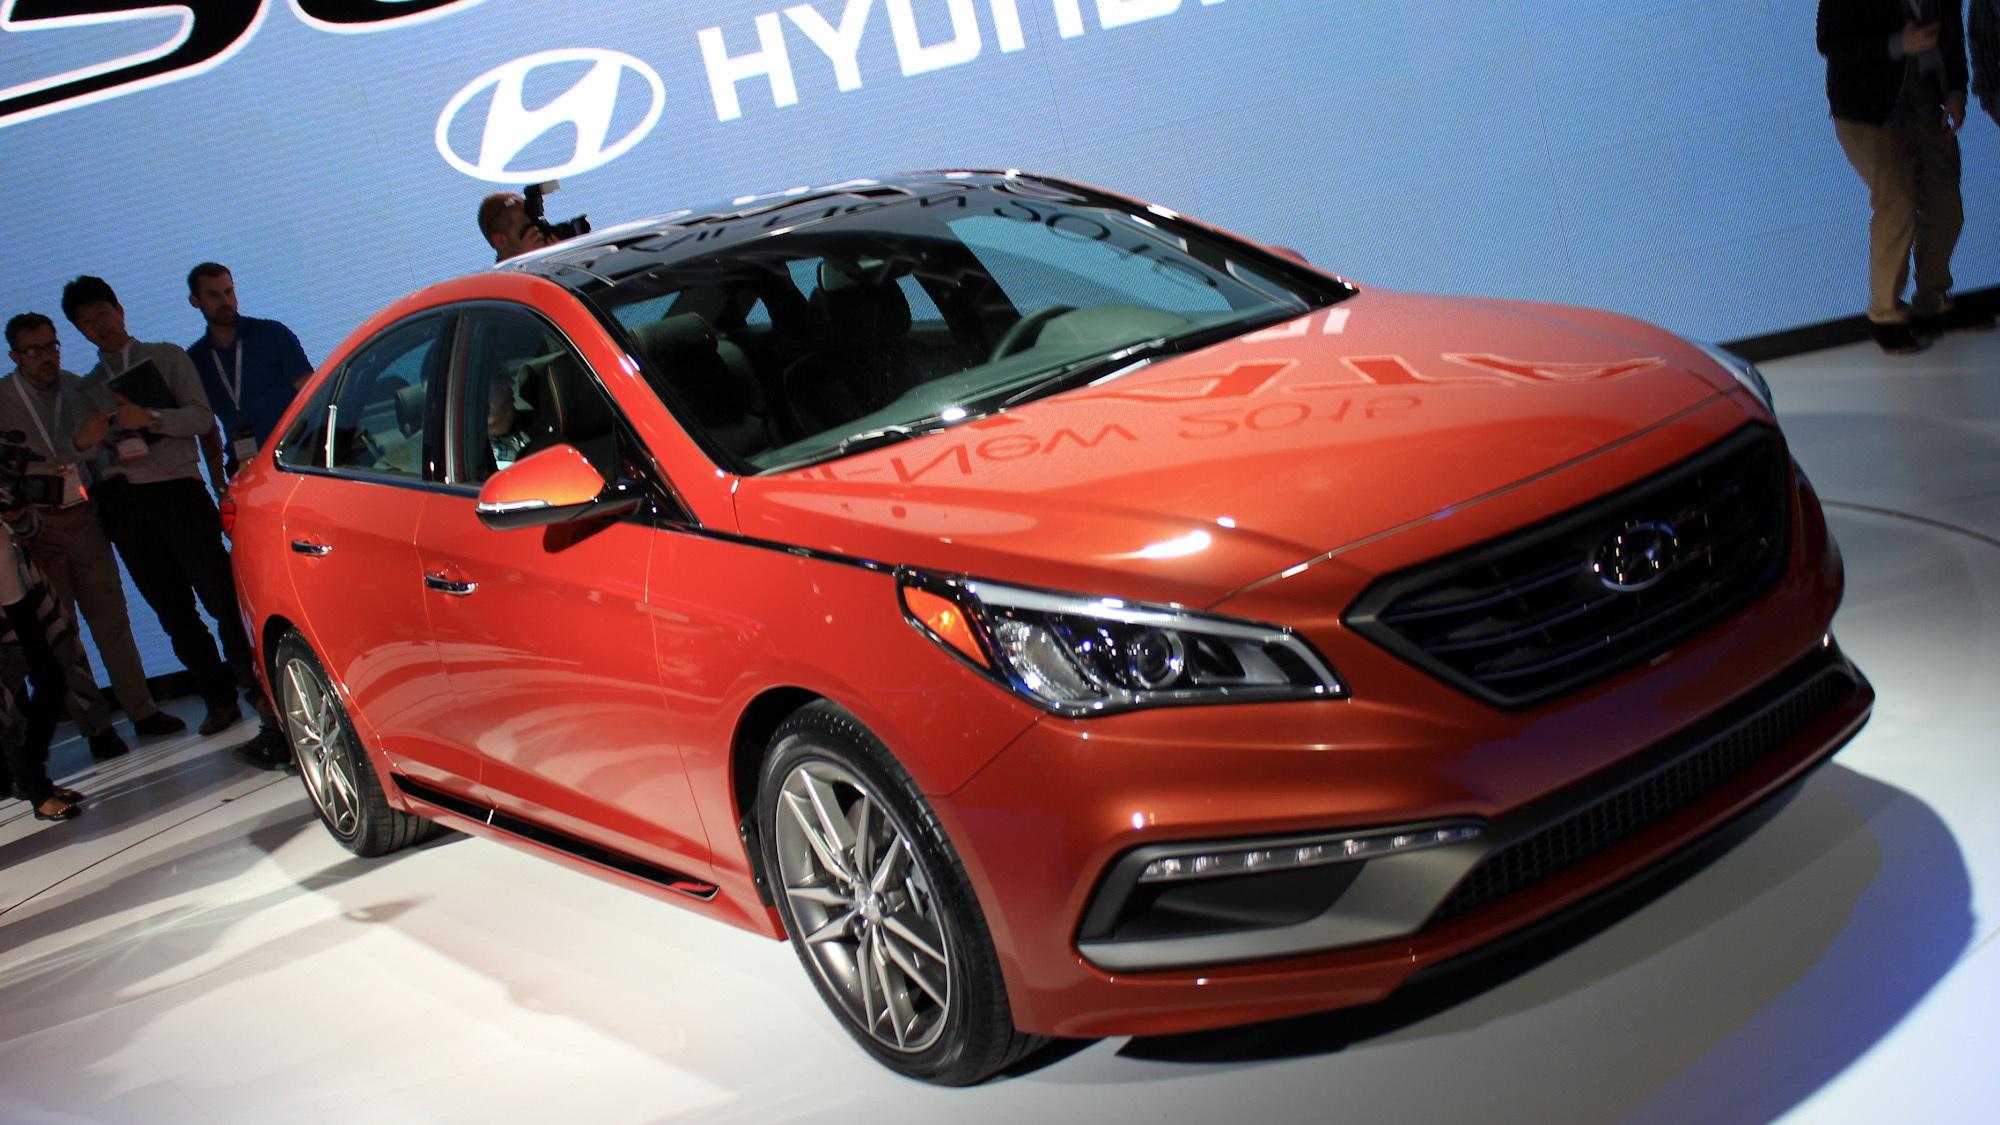 2015 Hyundai Sonata, 2014 New York Auto Show